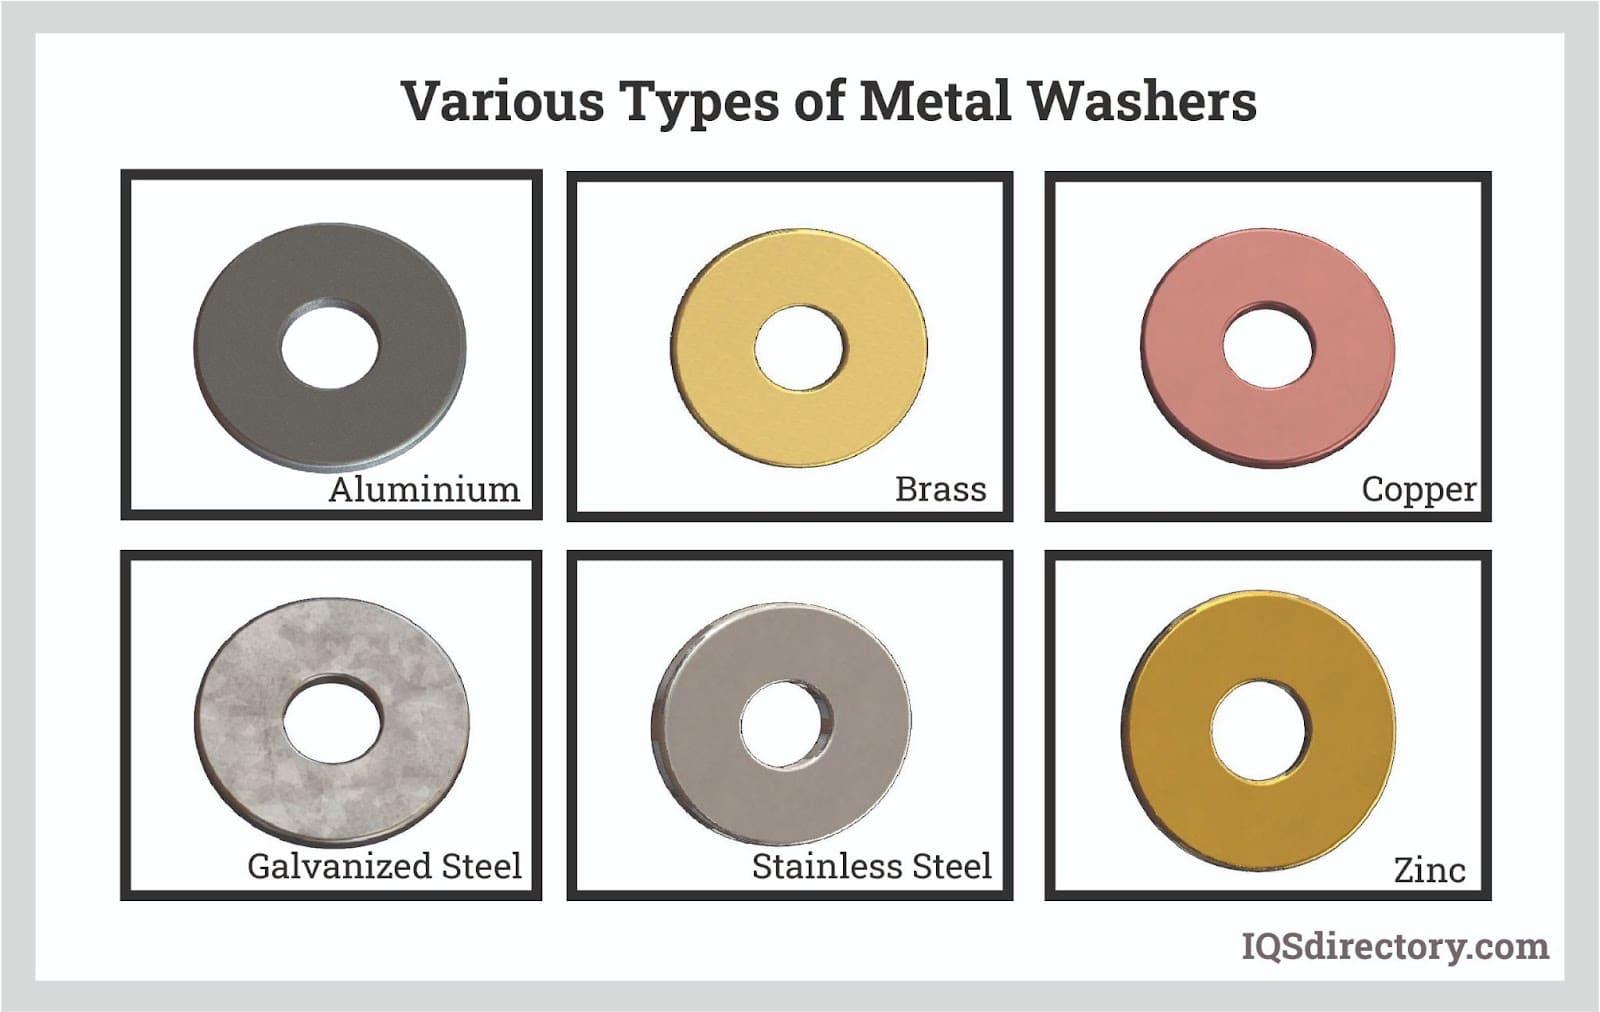 Various Types of Metal Washers